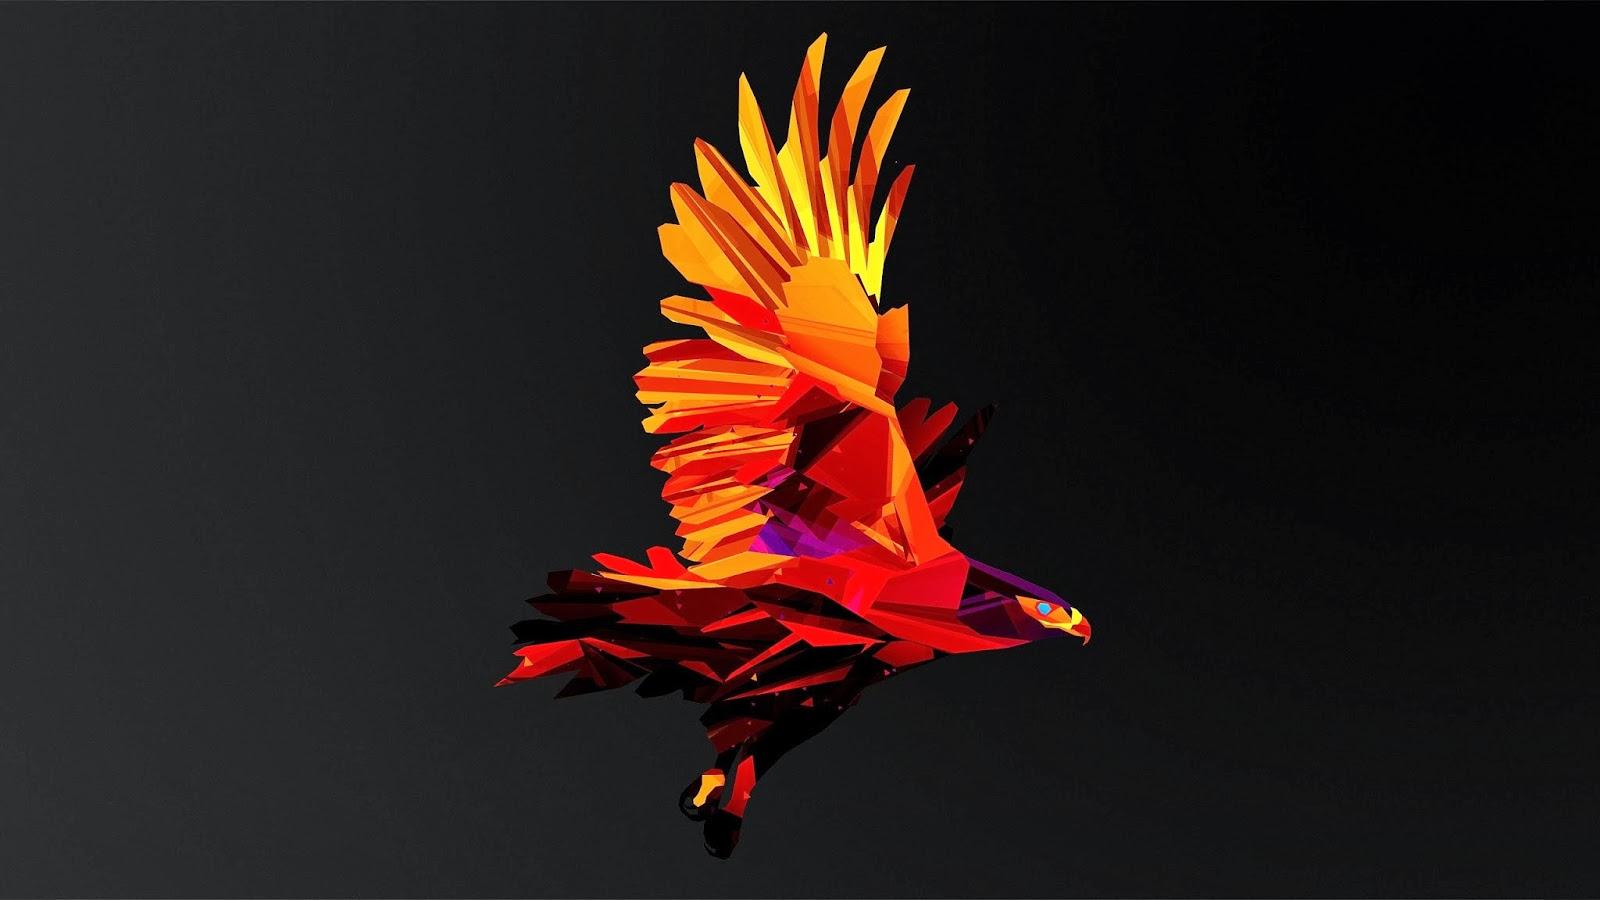 Aguila De Fuego En 3d Fondos Pantalla Hd Wallpapers Low